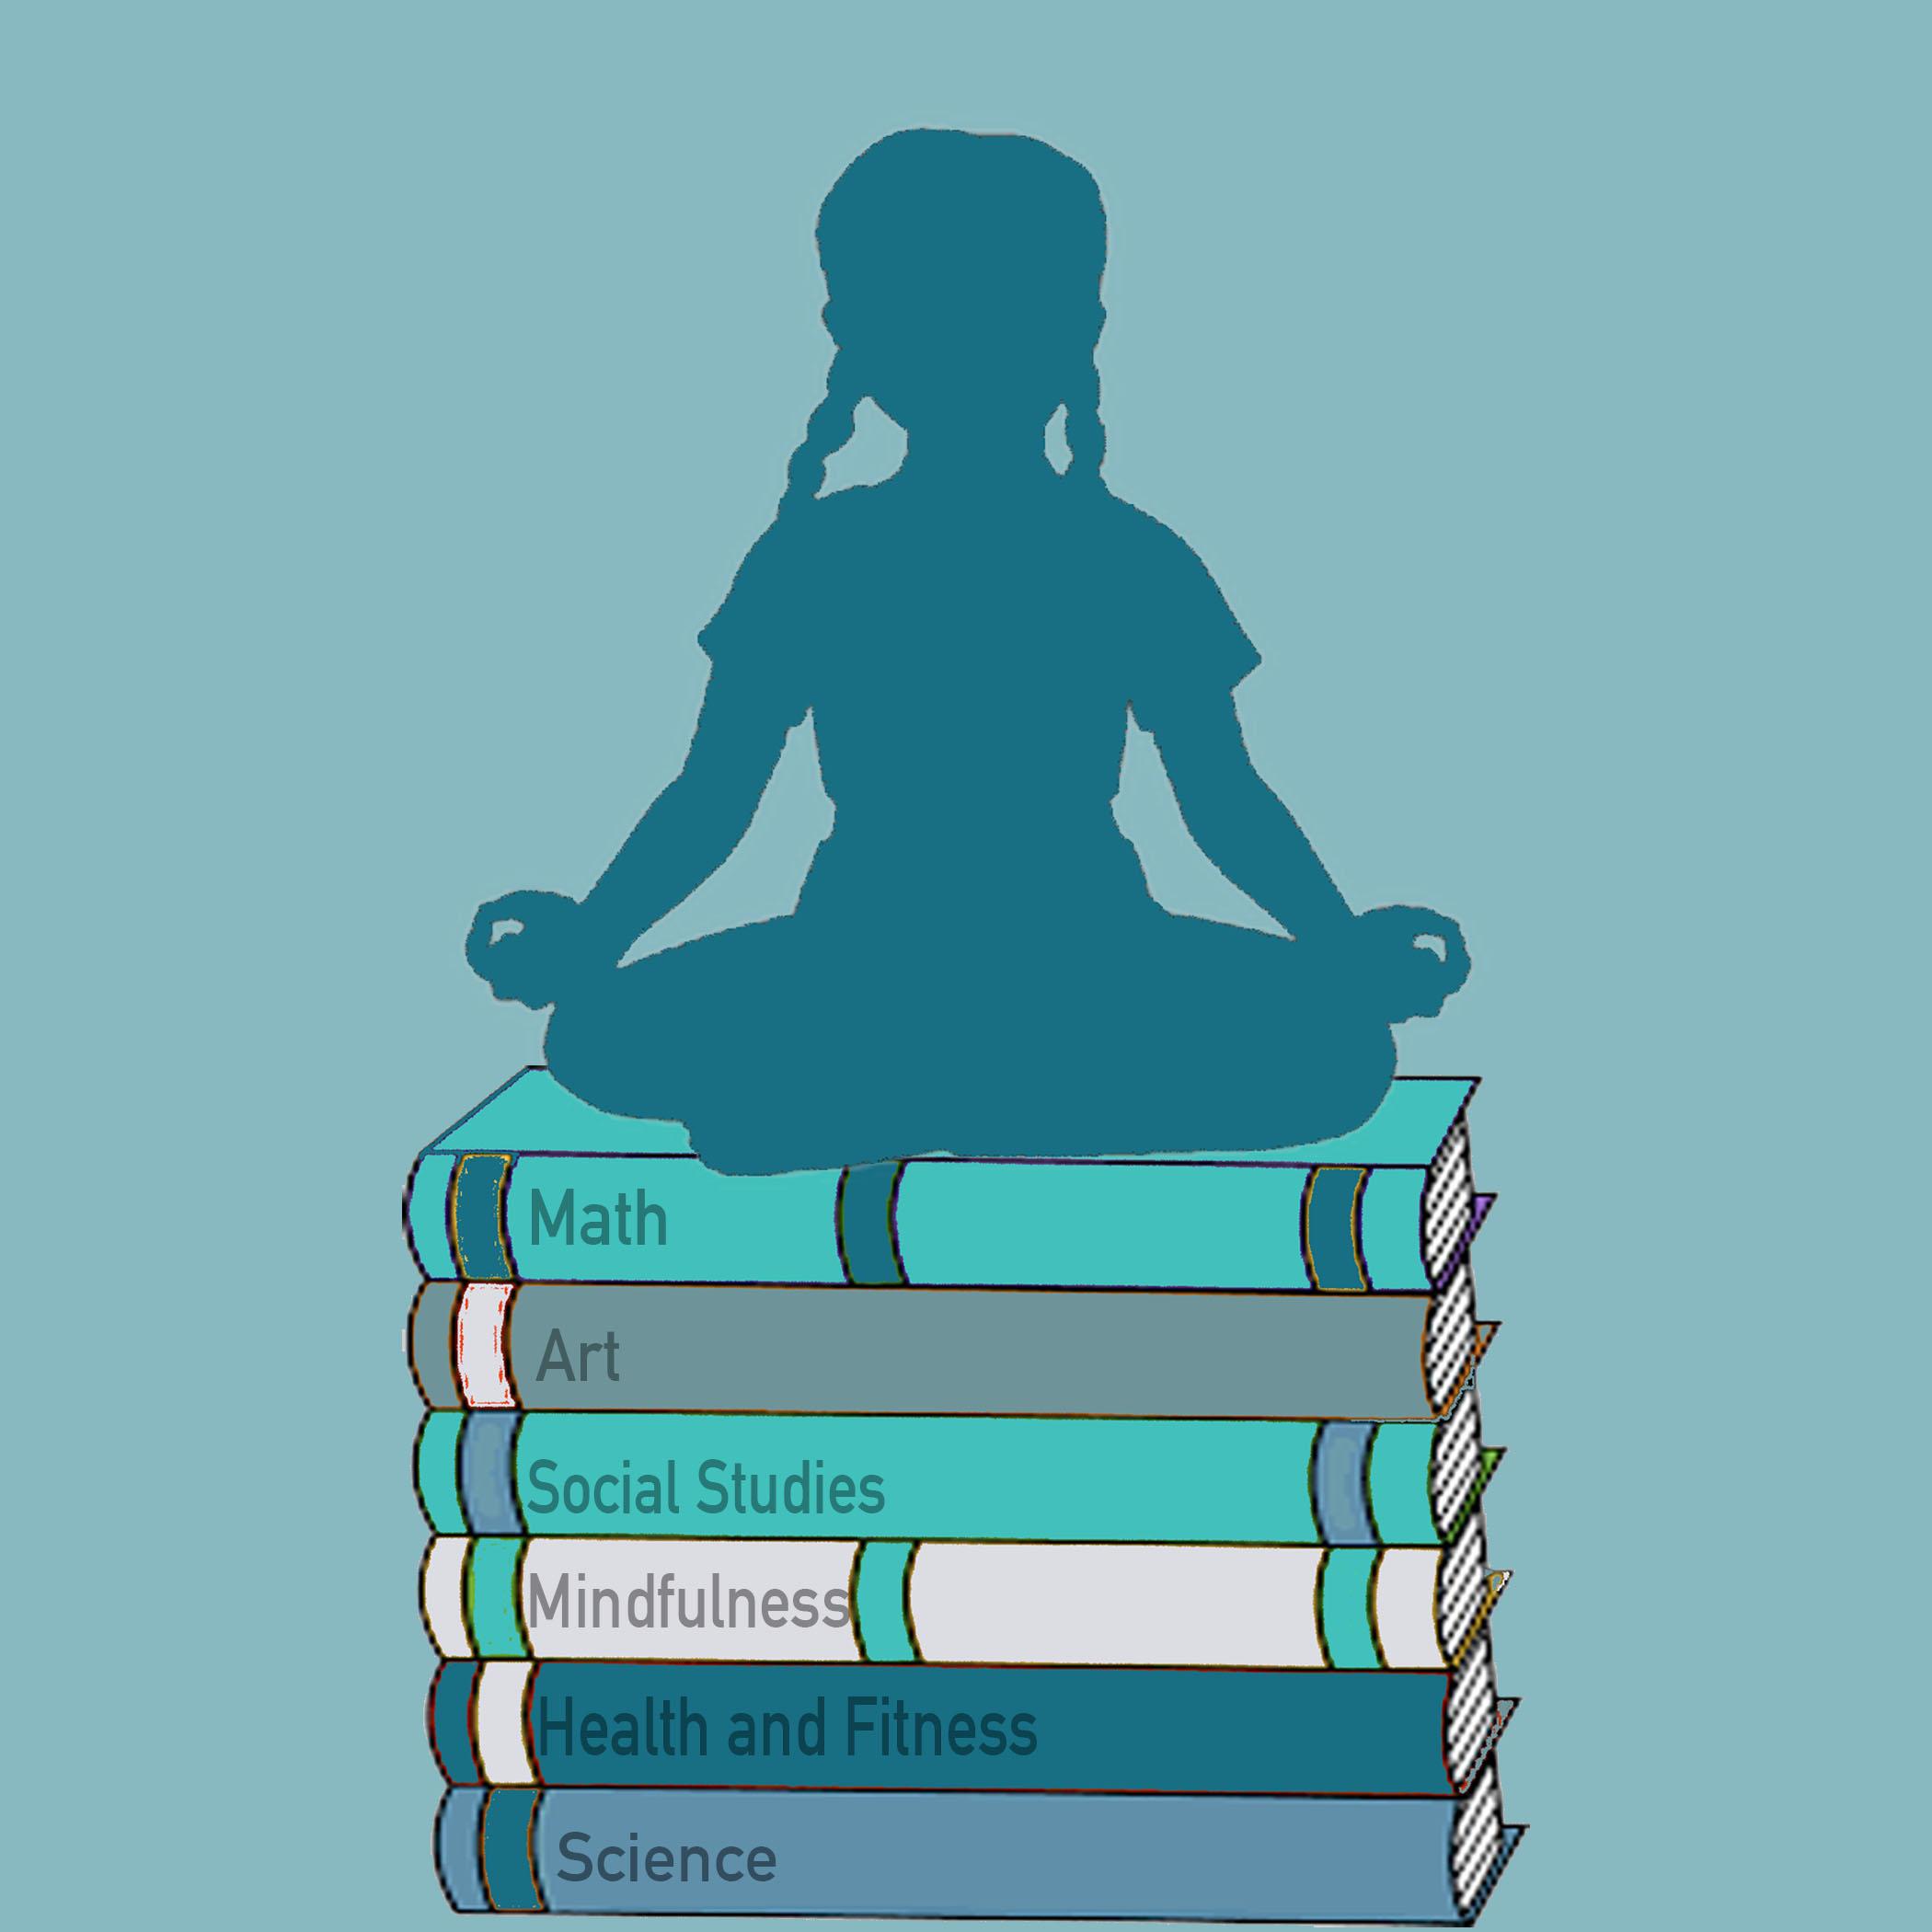 mindfulness in north carolina schools